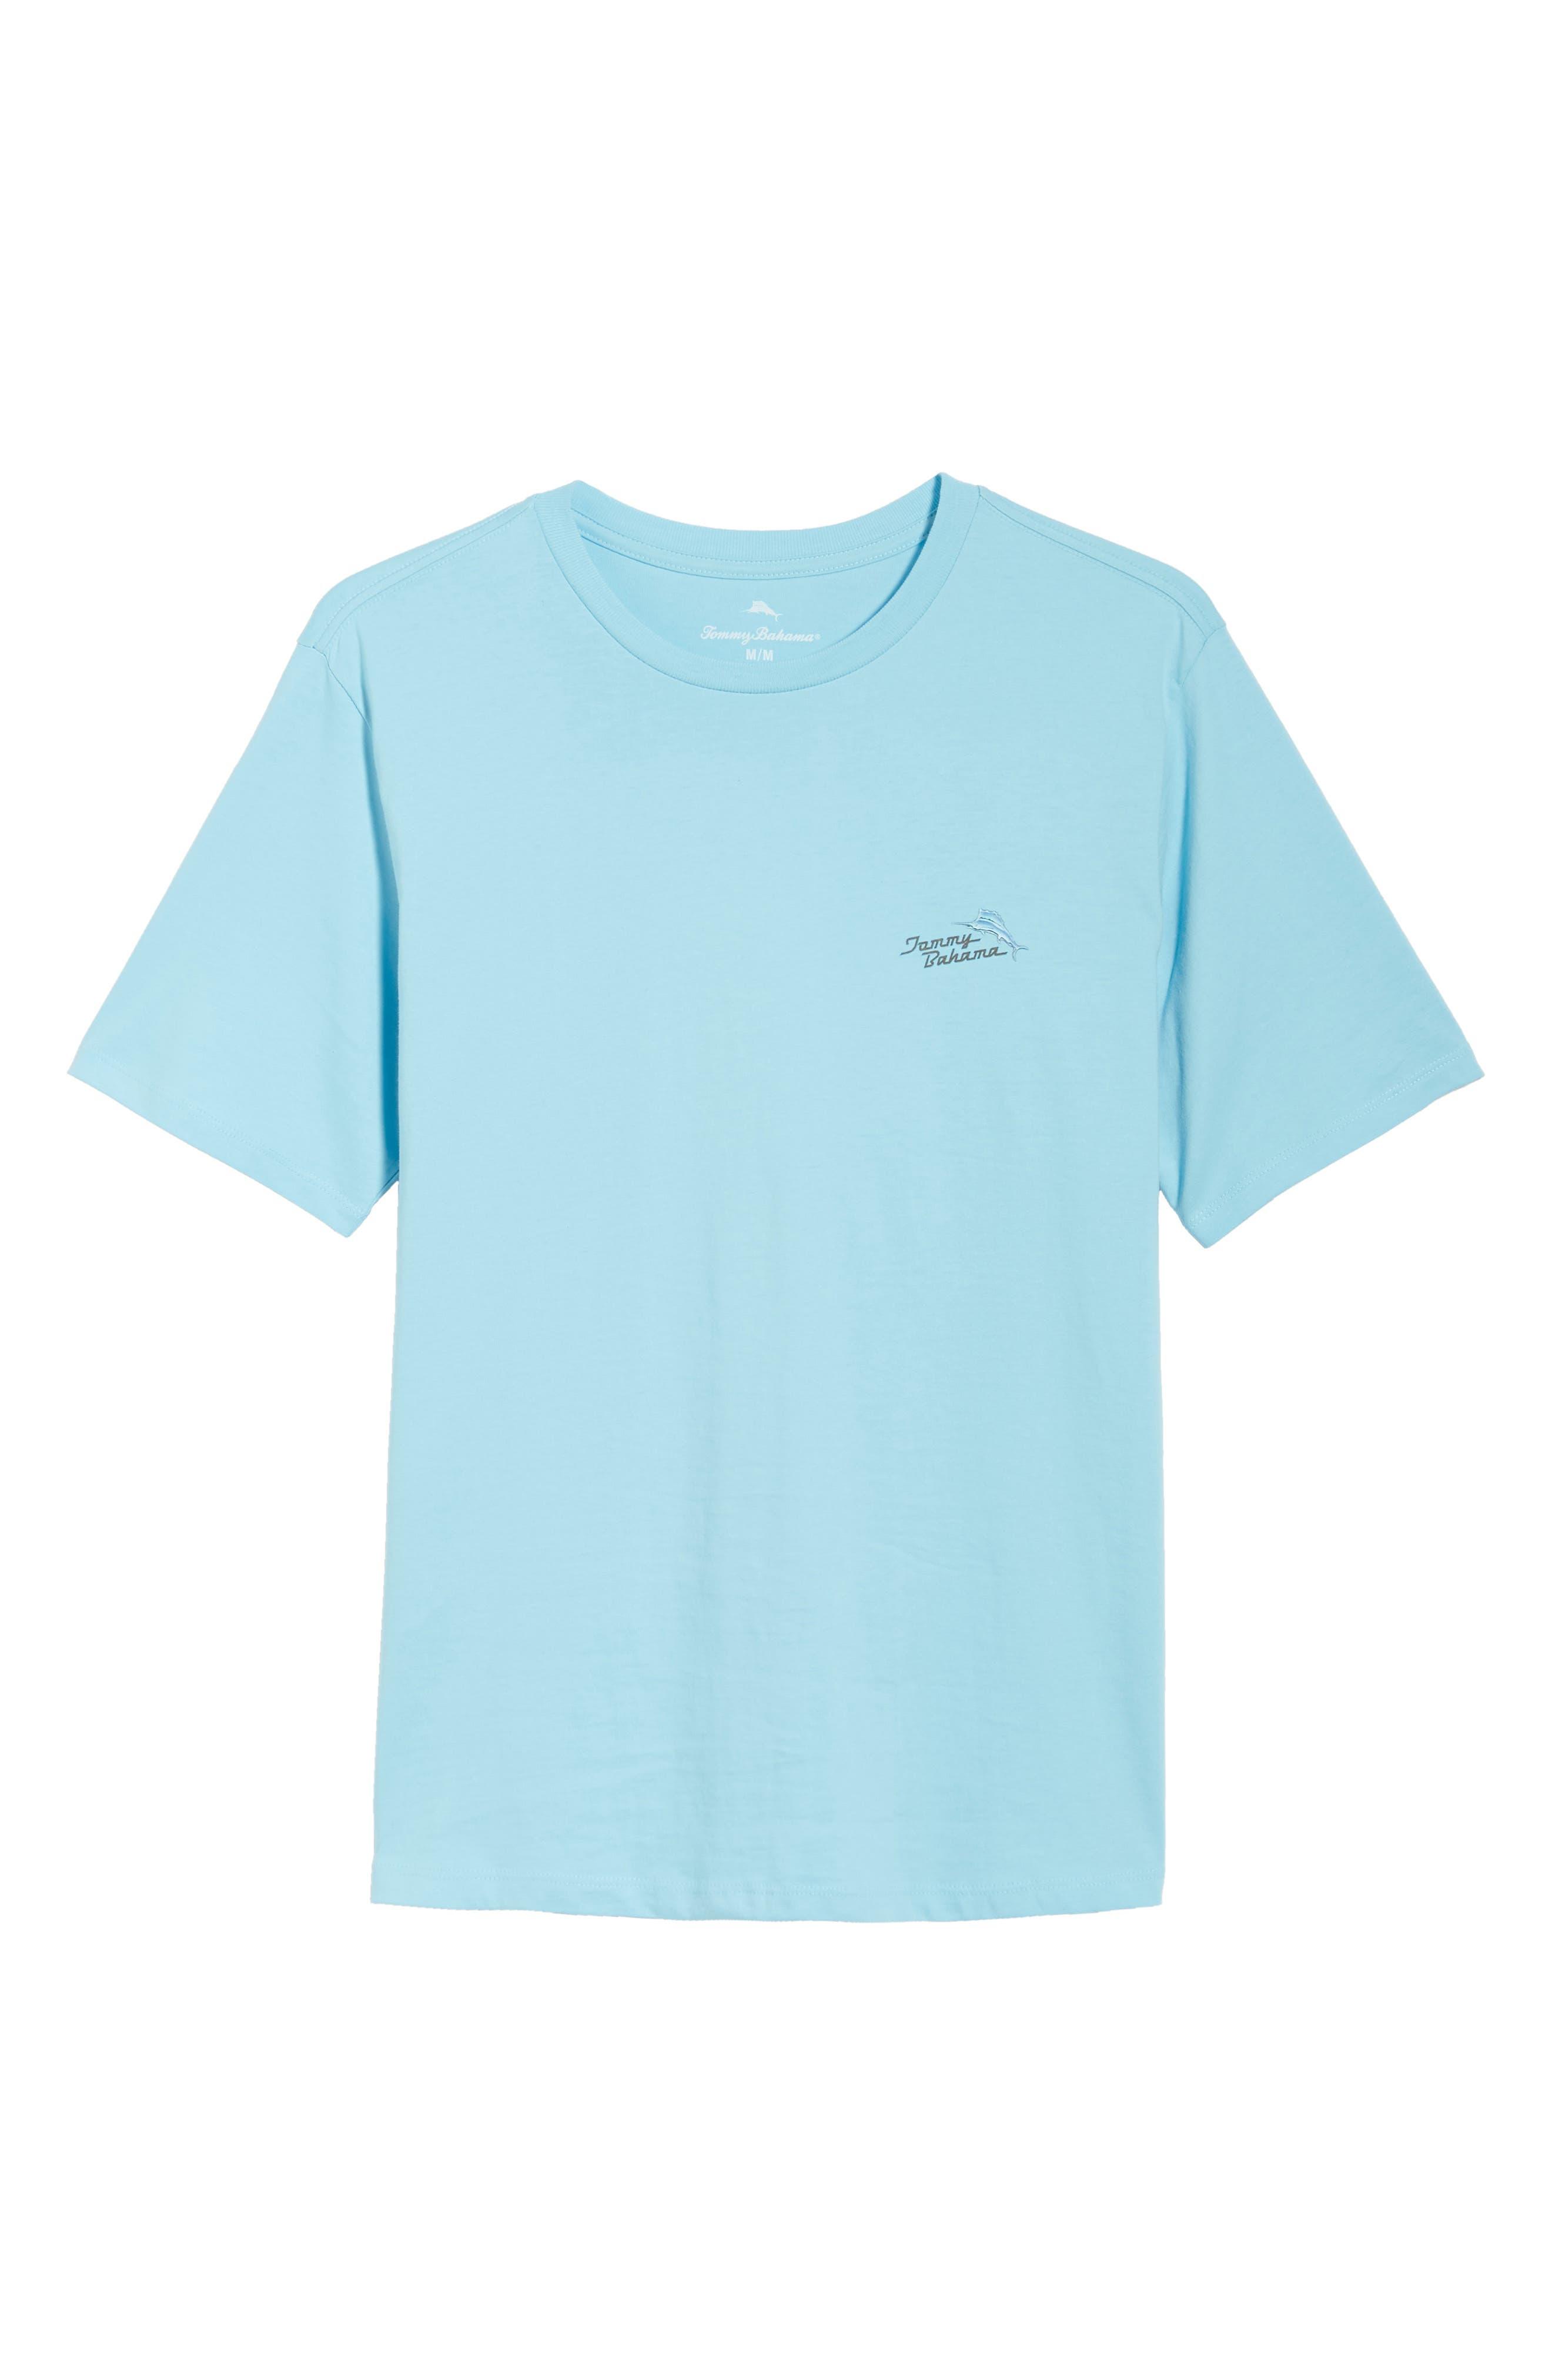 Beach Grille T-Shirt,                             Alternate thumbnail 6, color,                             400